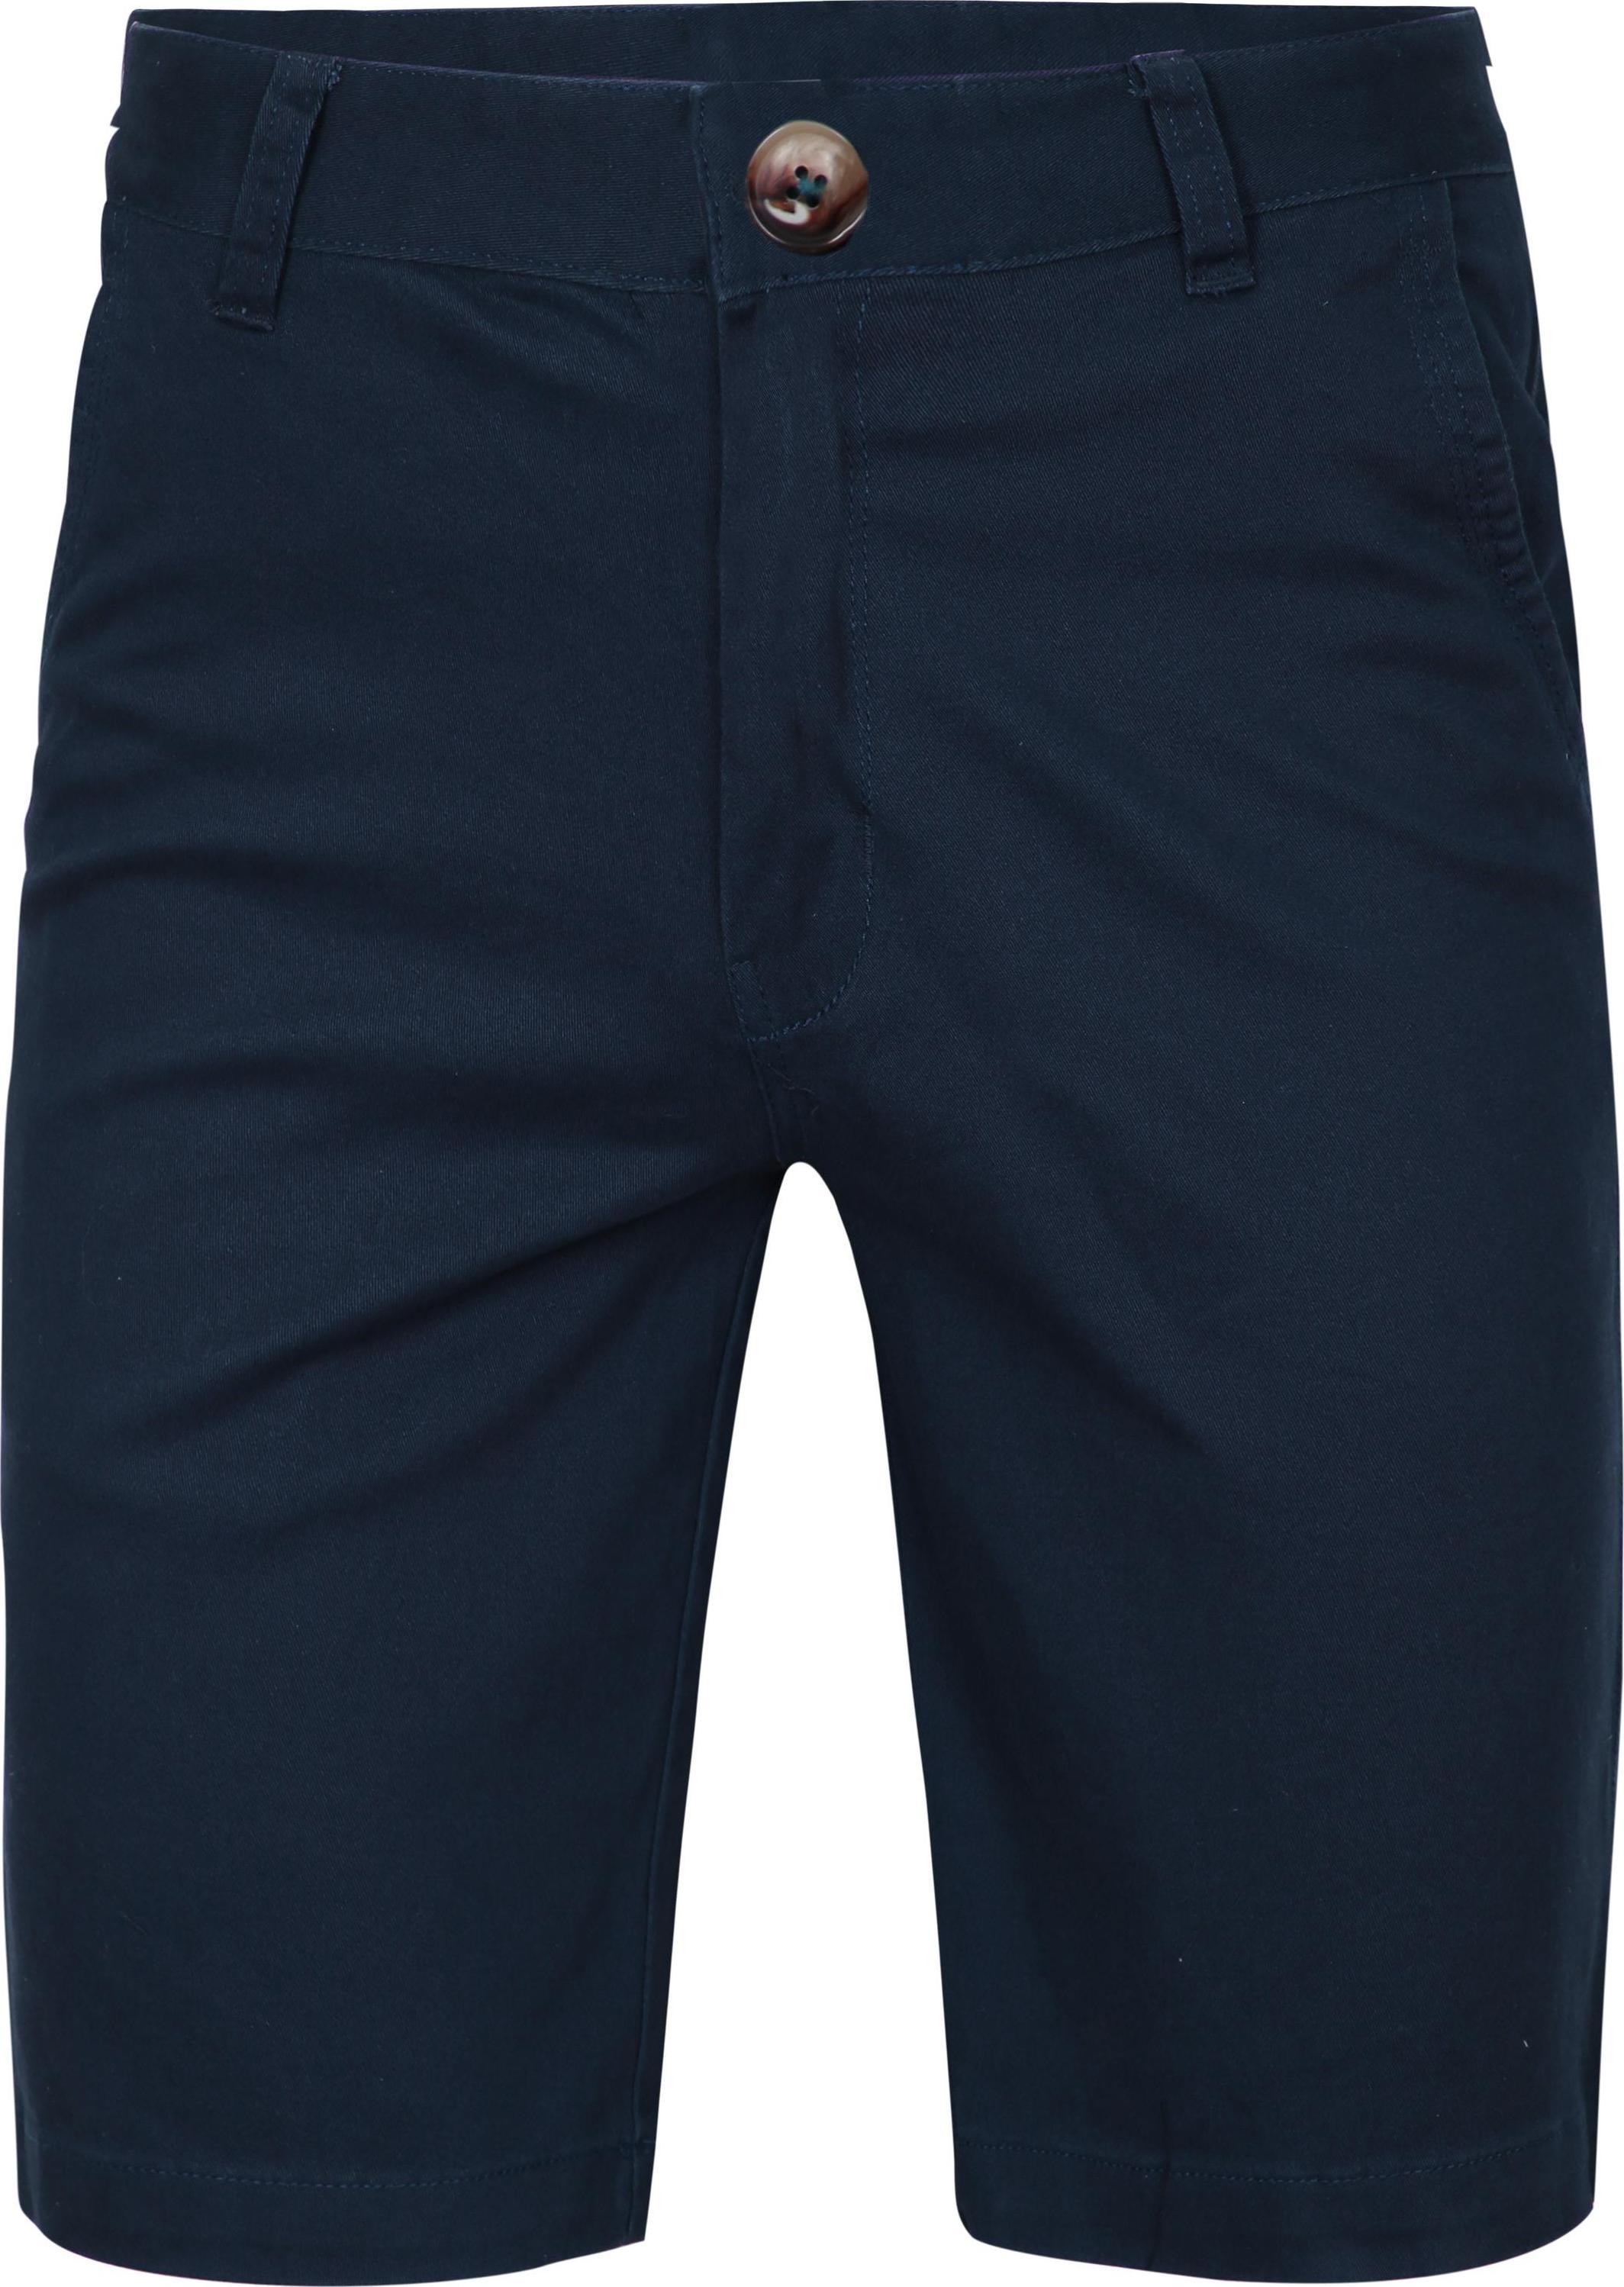 Quần short kaki nam thun thời trang KKT405